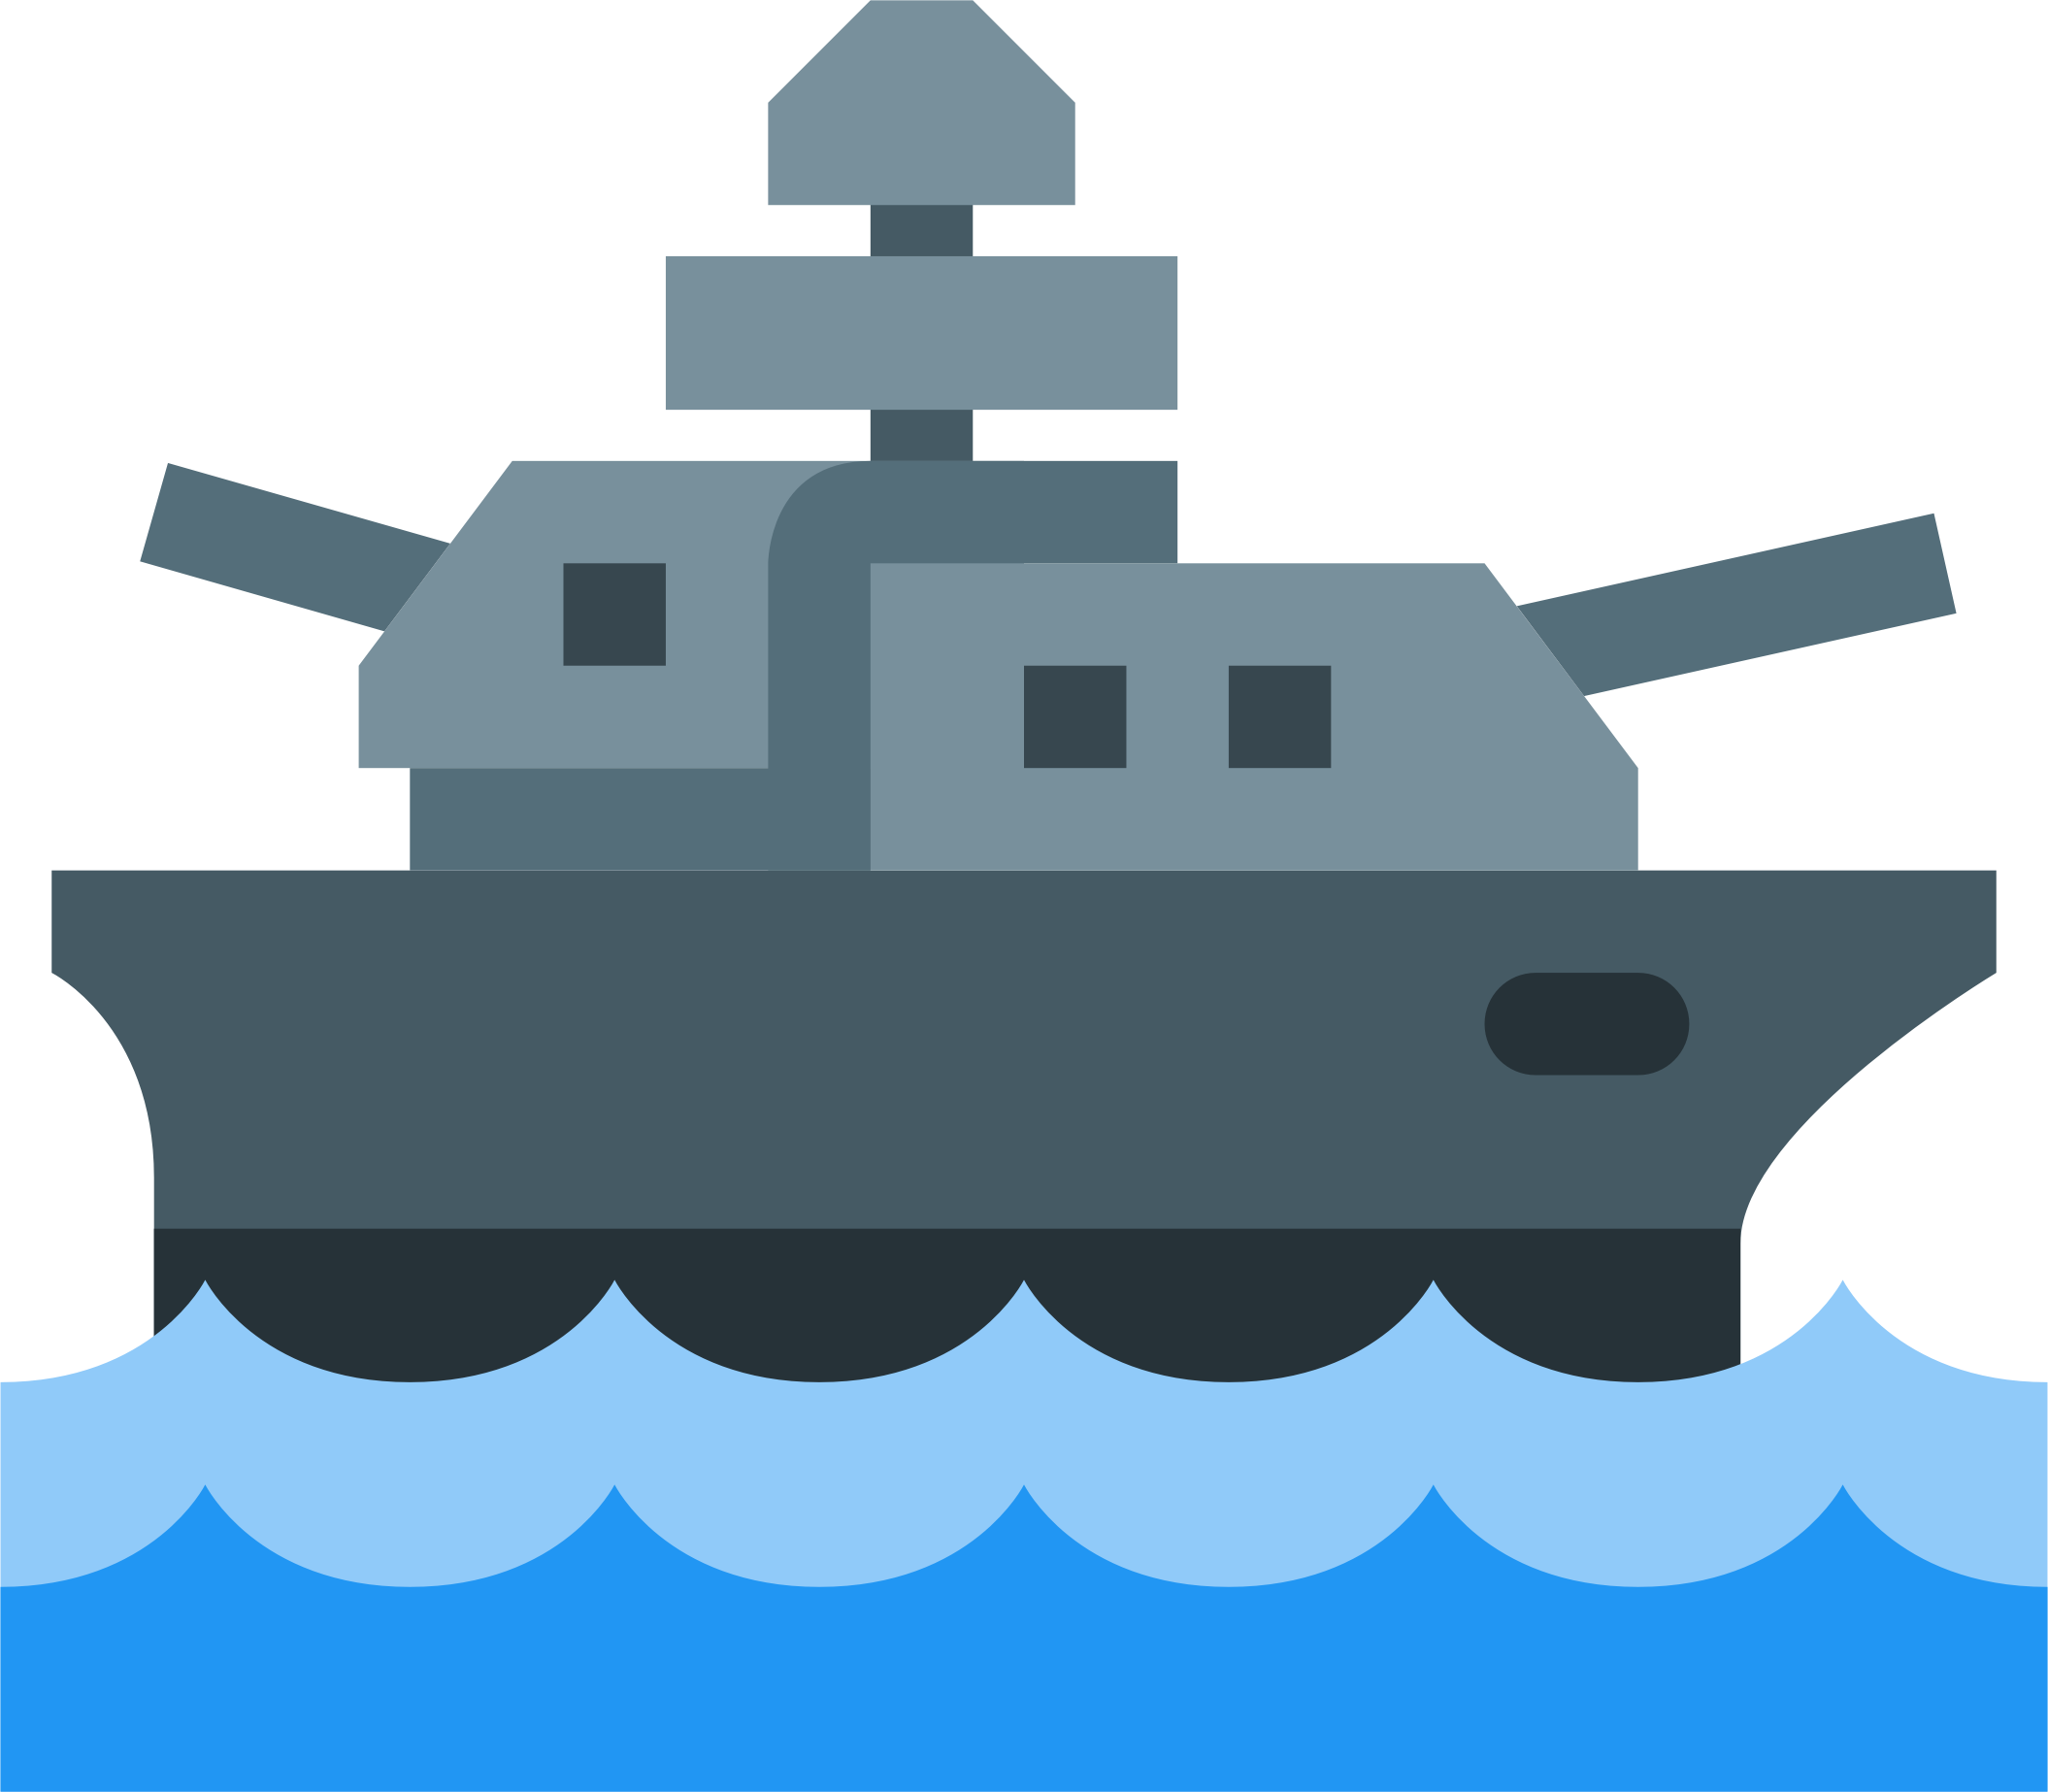 Big image png. Battleship clipart clip art